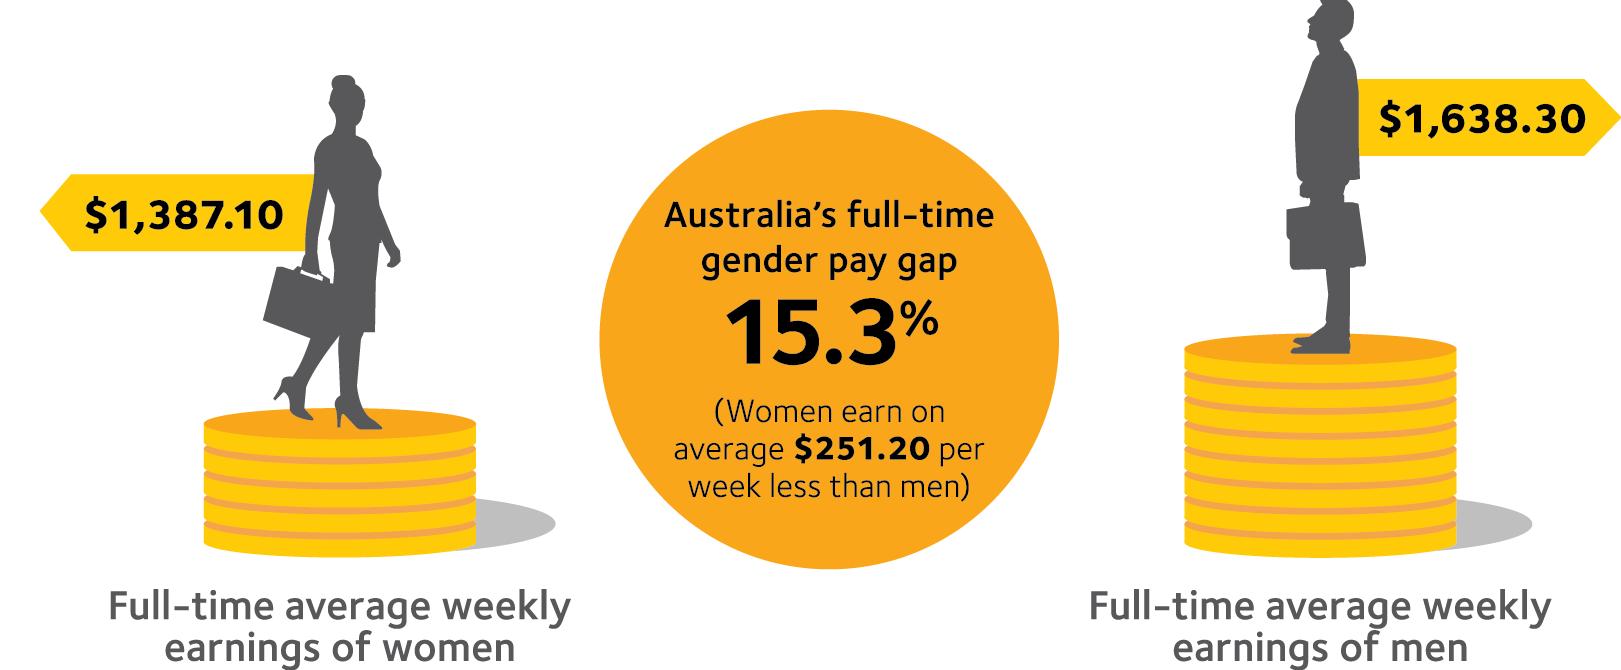 gender wage gap in australia essay Argumentative essay on gender pay gap youtube.